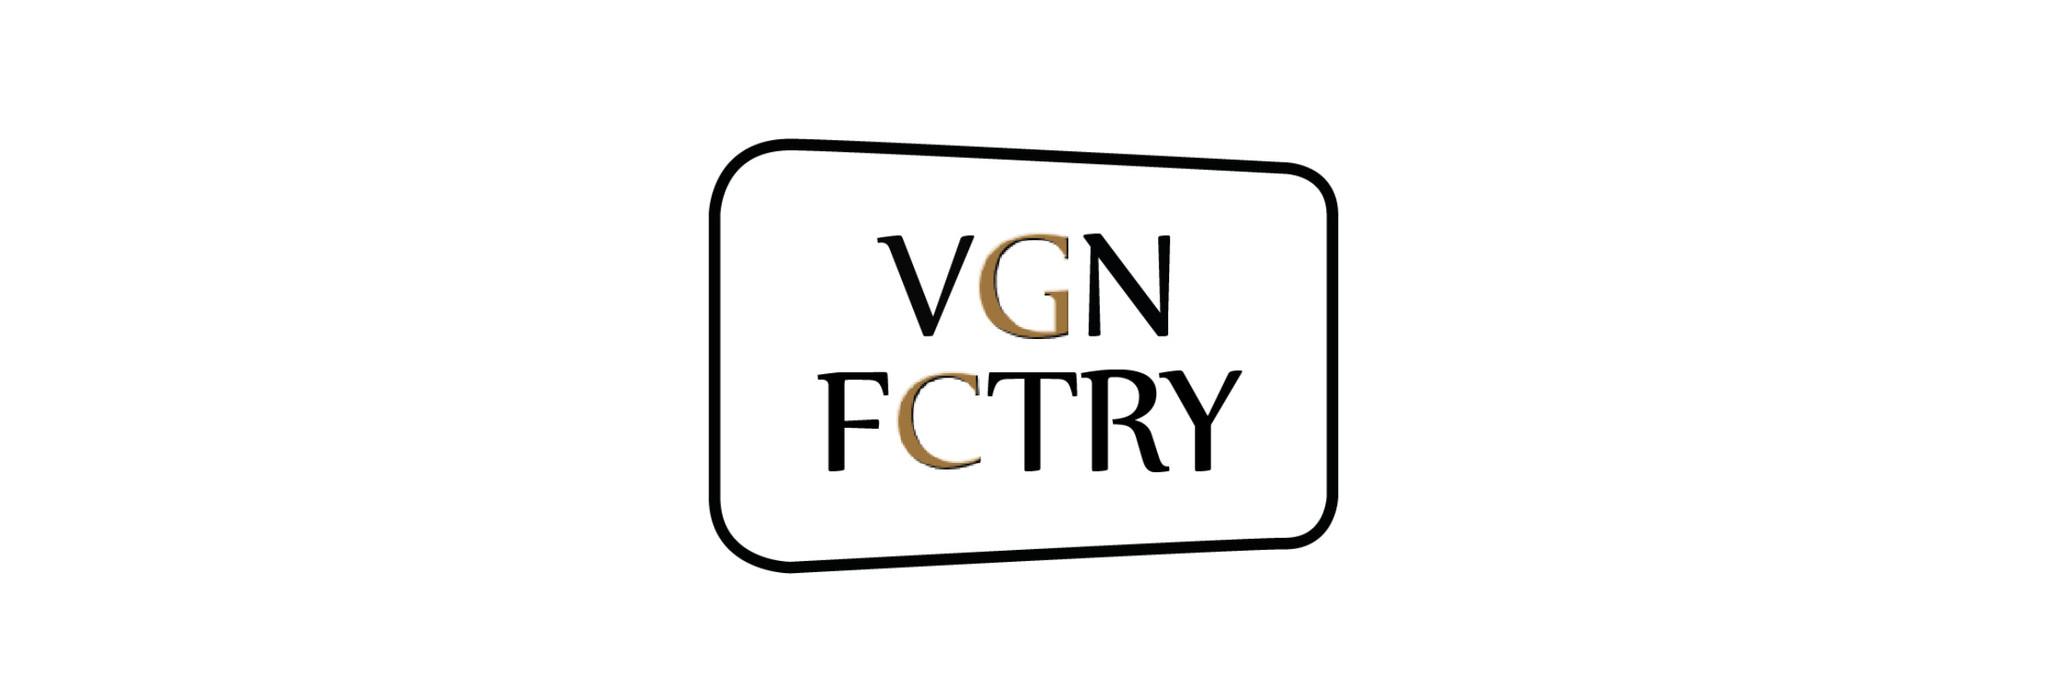 VGN FCTRY